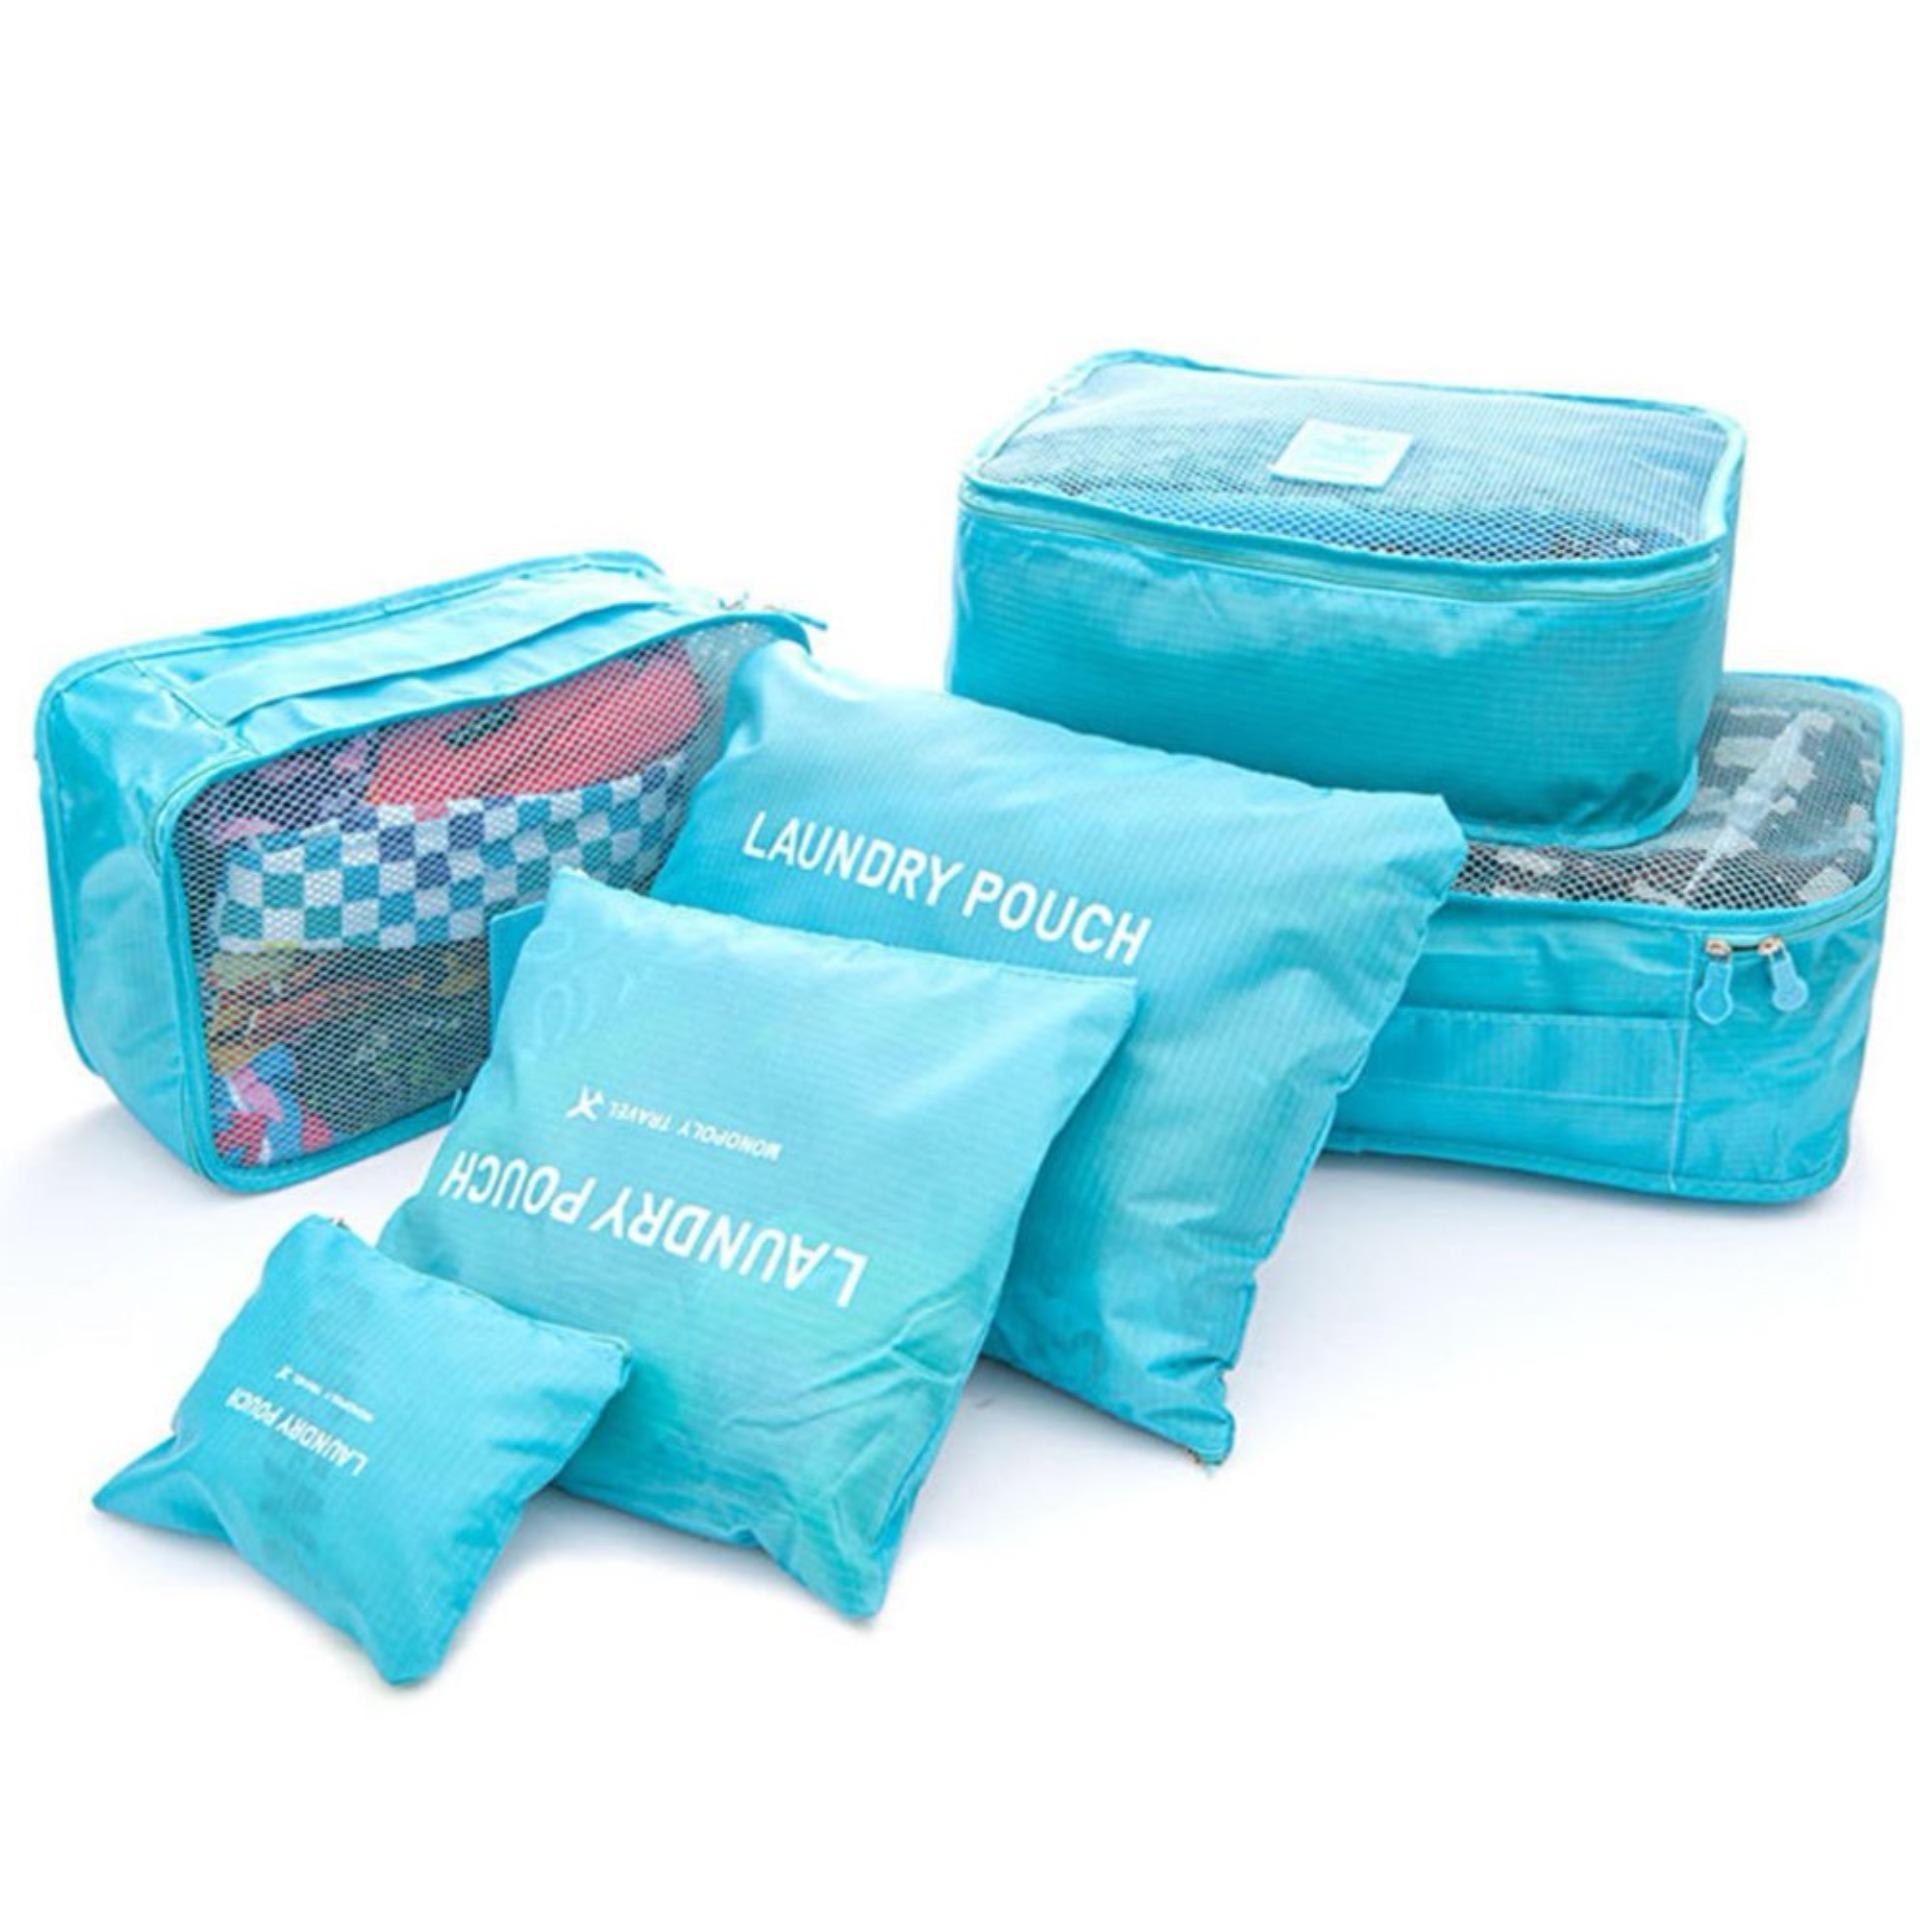 Travelling Bag 6 In 1 - Pouch Set - Organizer - Travel Bag Organizer